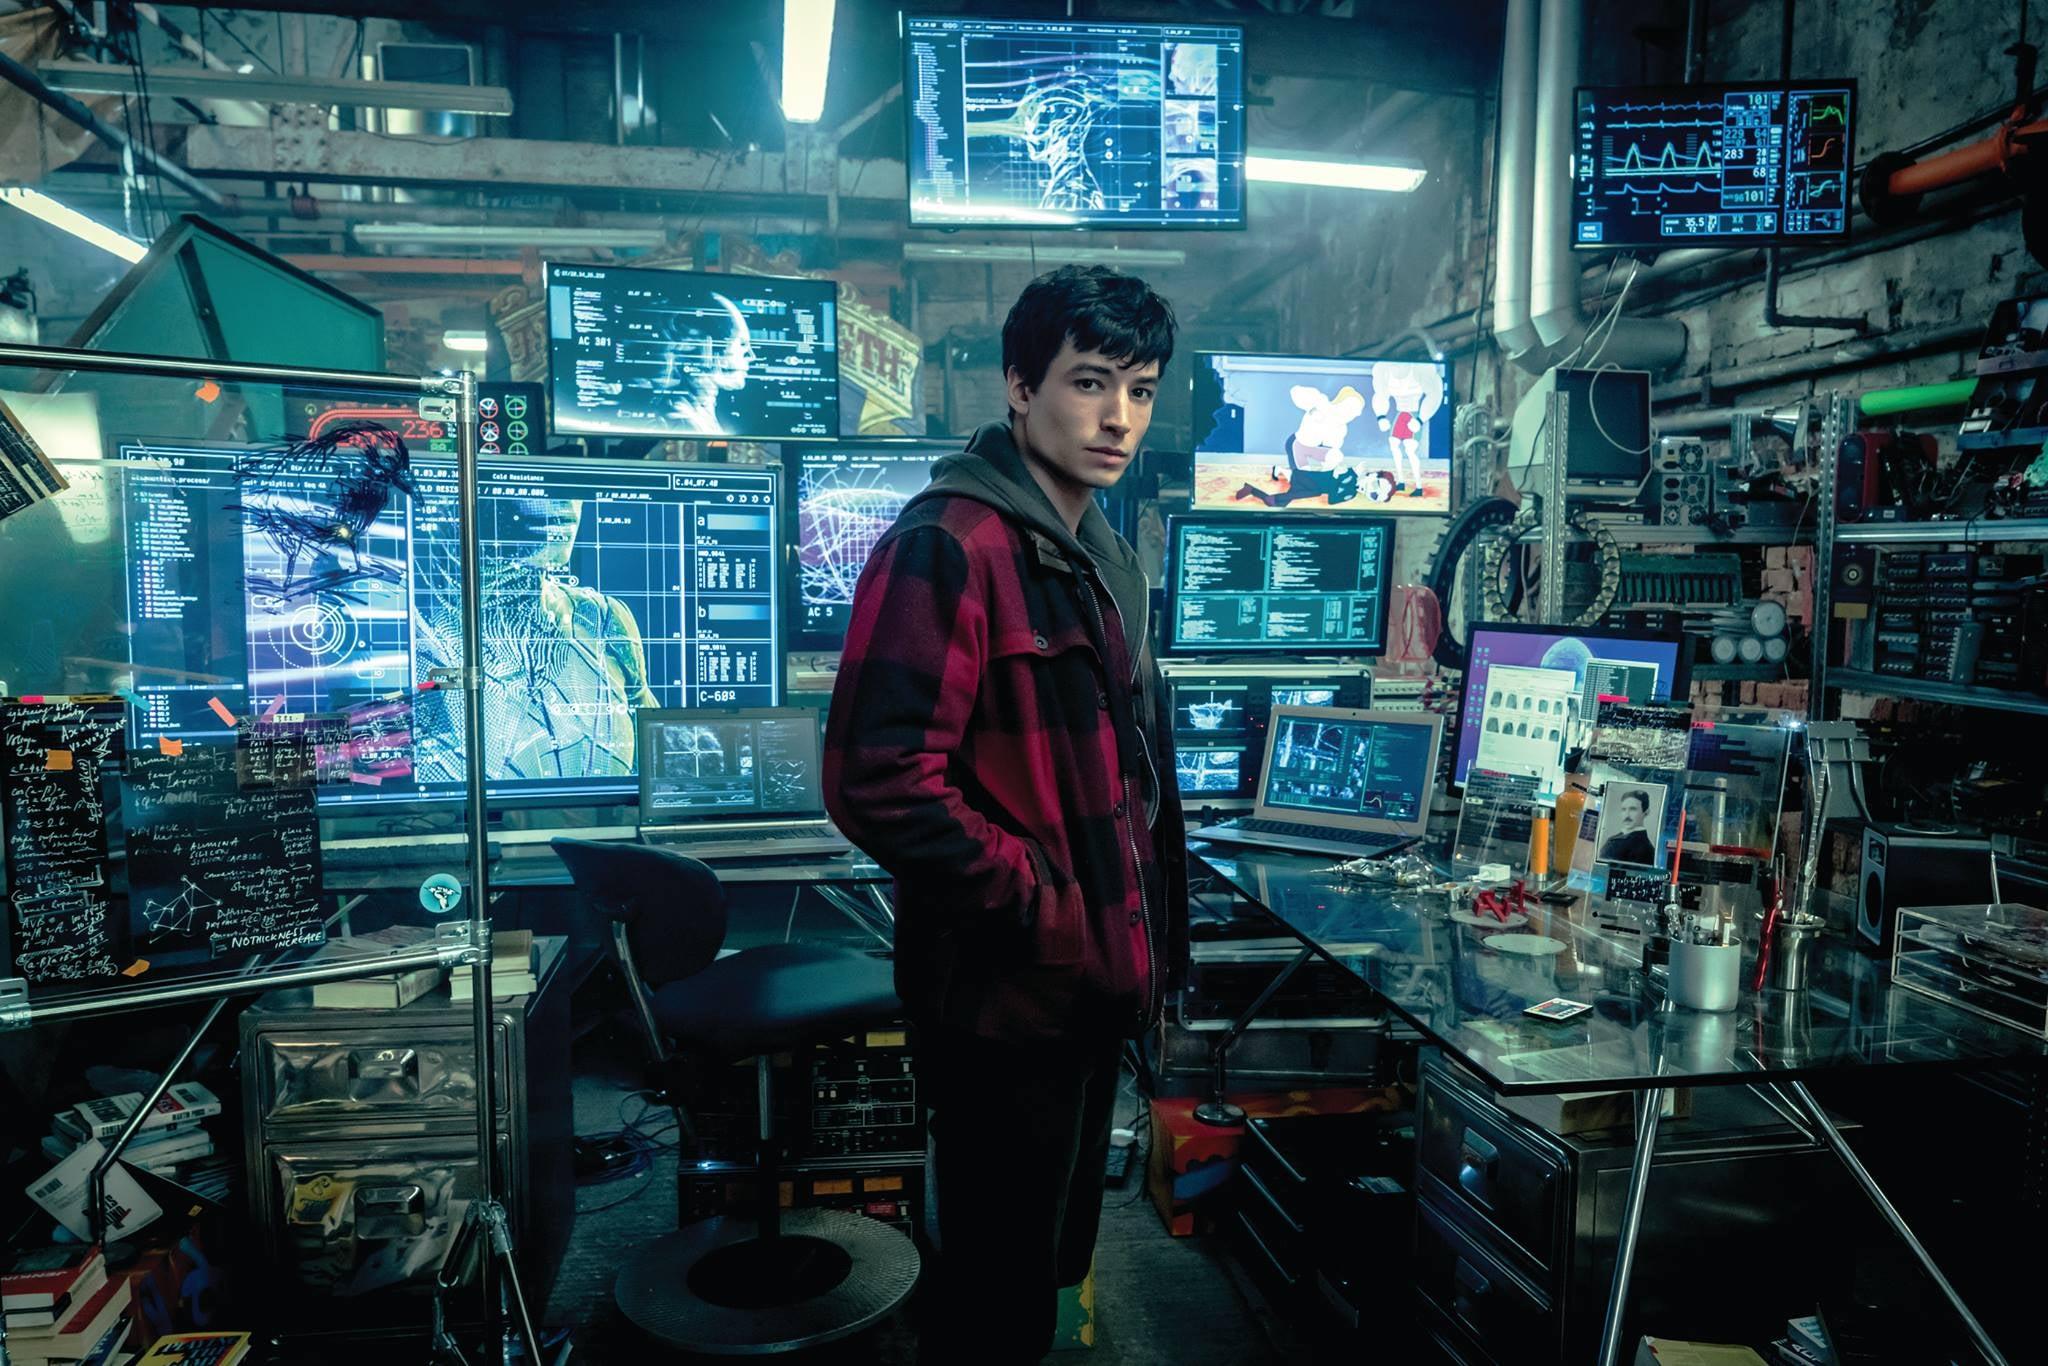 Justice League Movie Images Flash Cave HQ